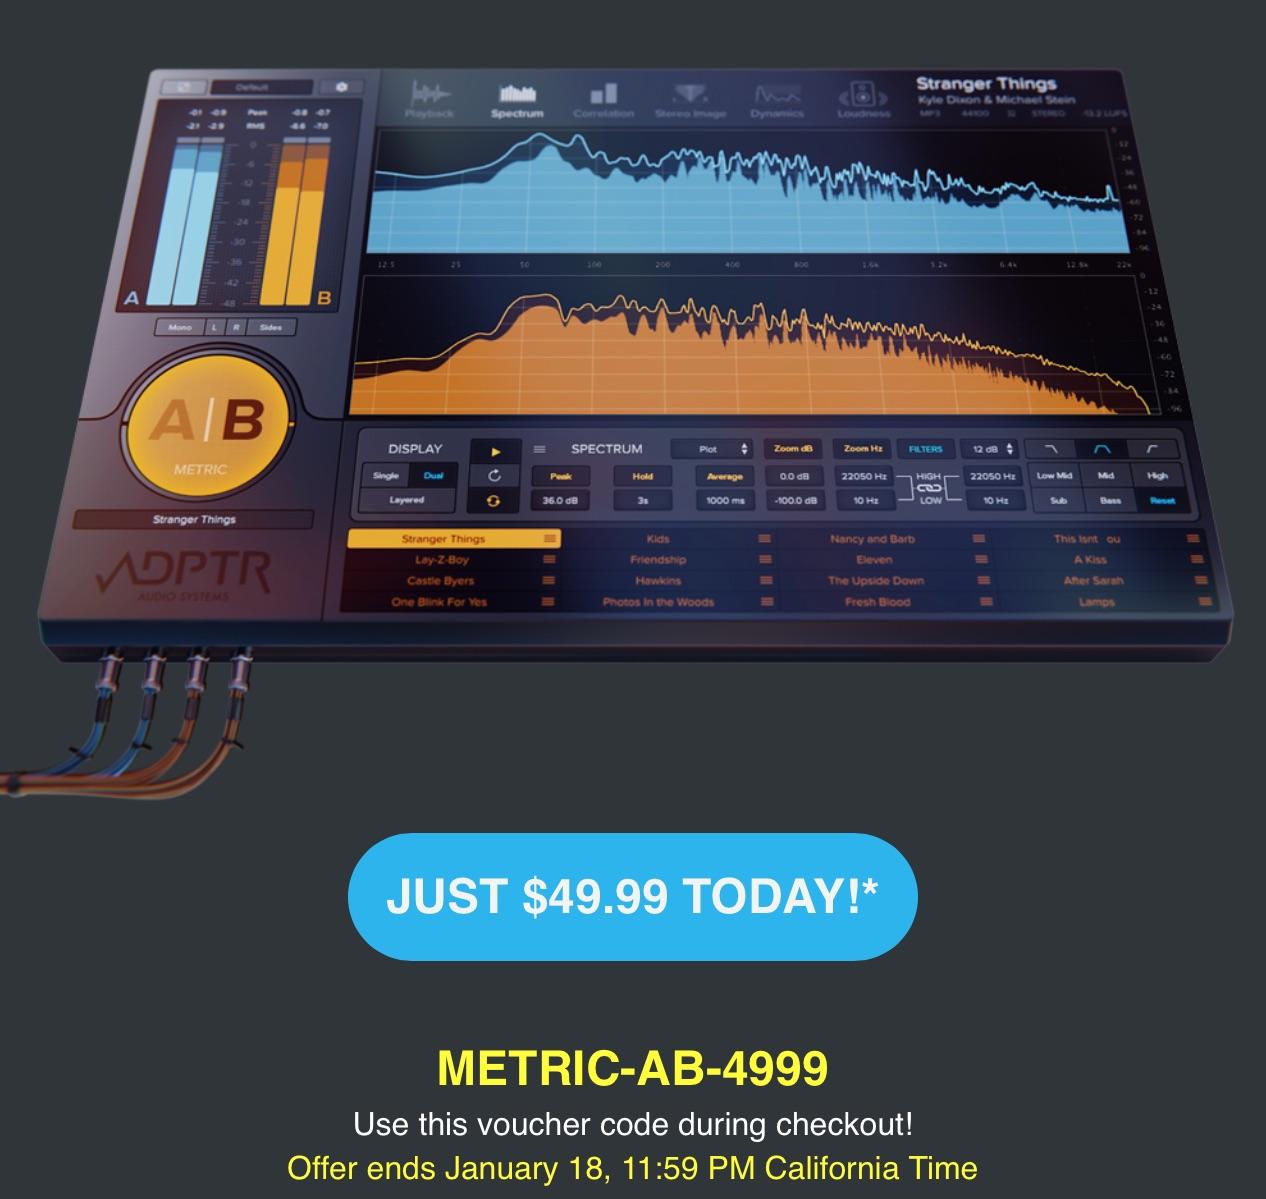 METRIC-AB-4999.jpg